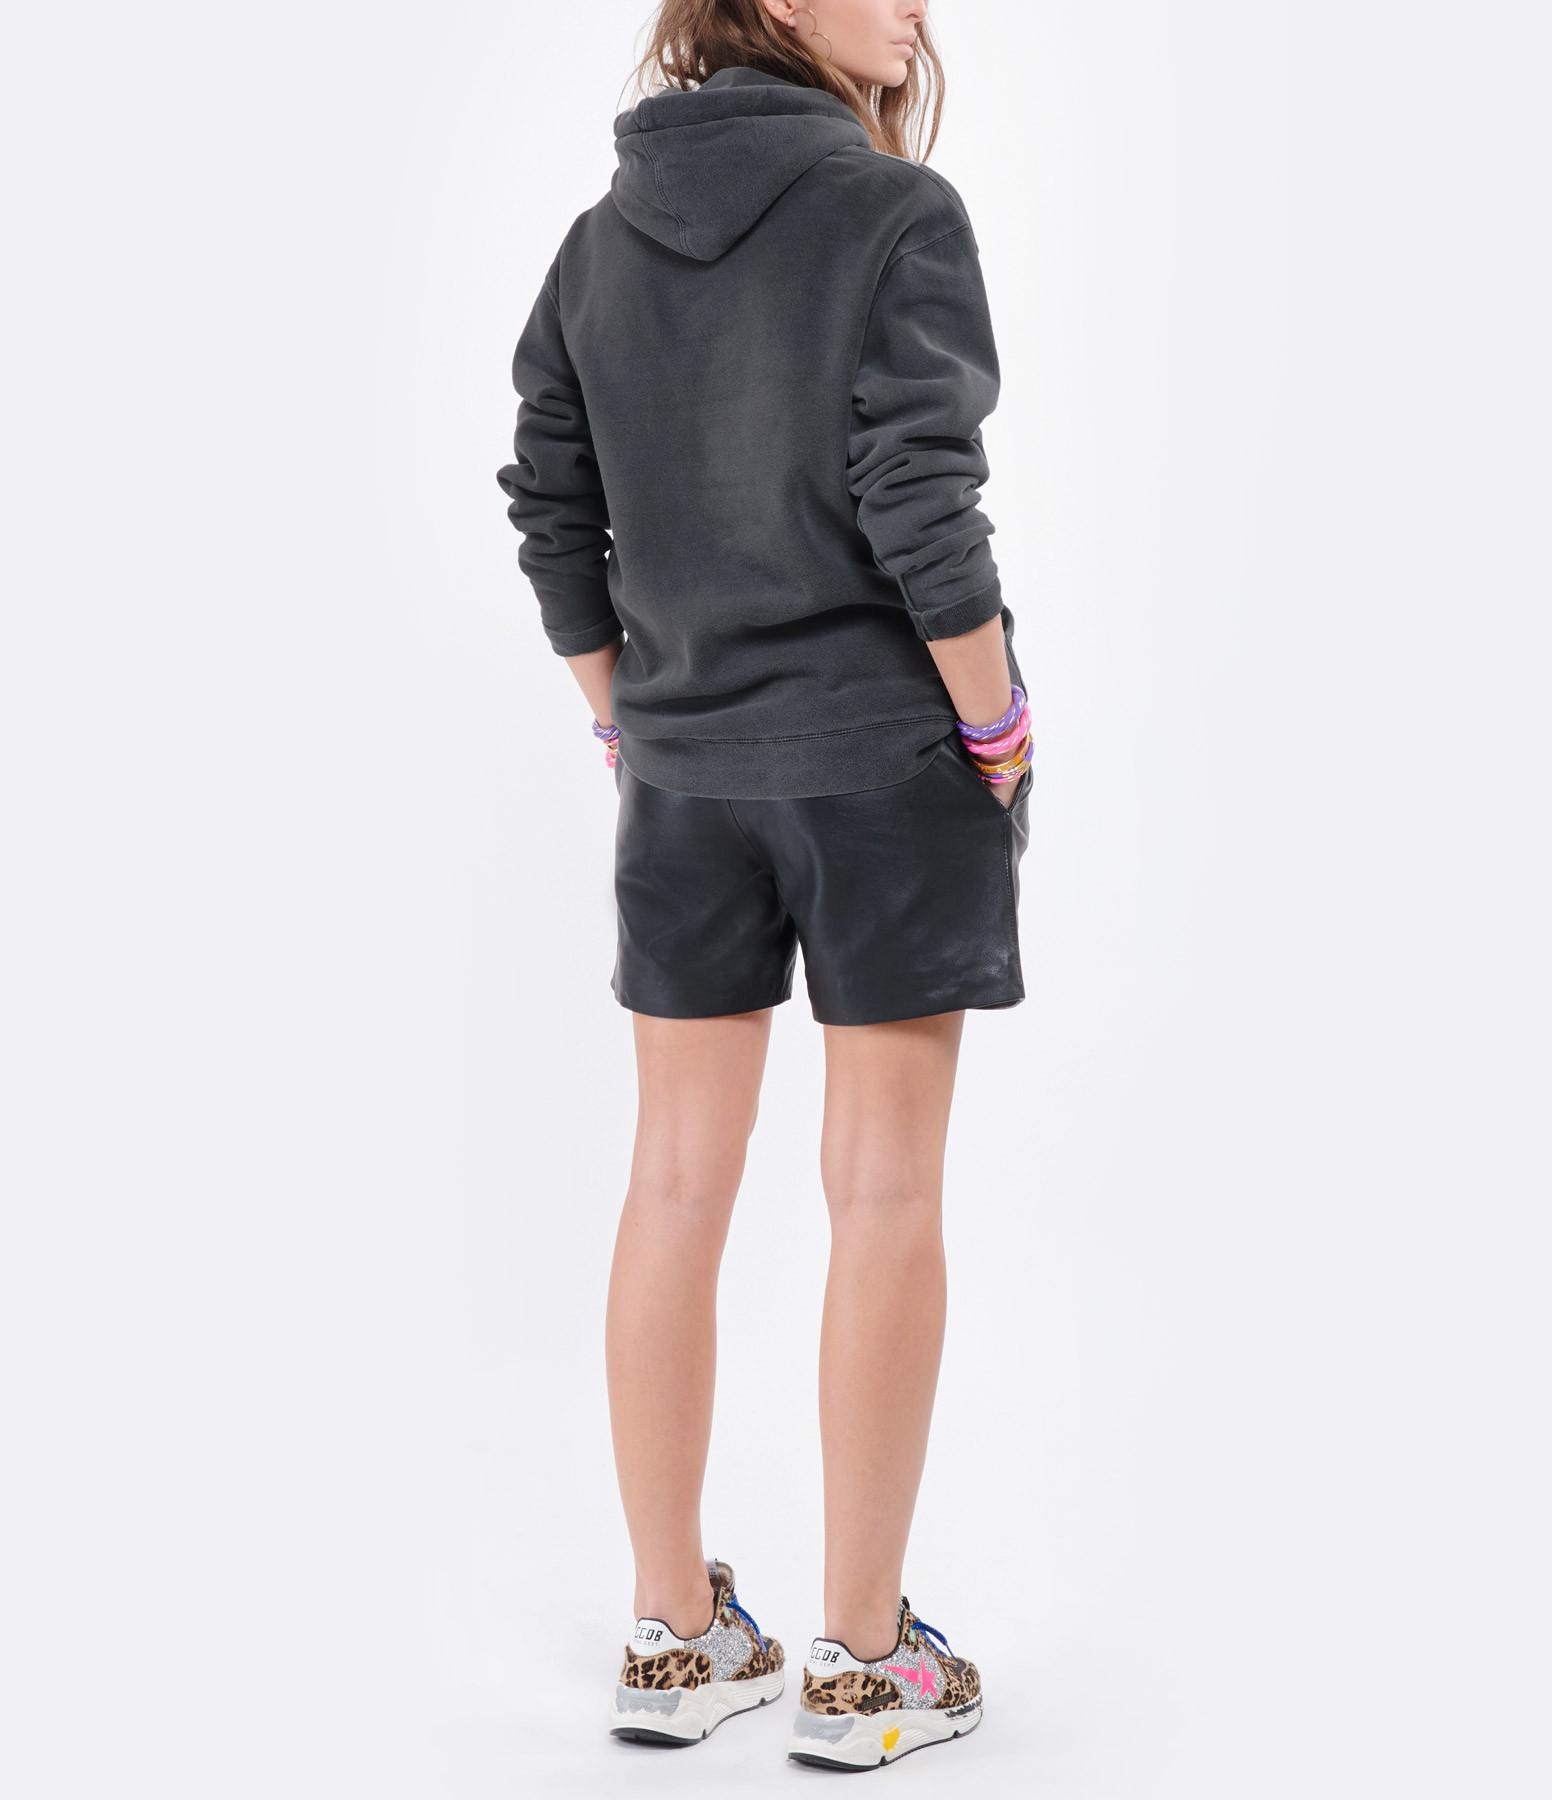 NEWTONE - Sweatshirt Roller Crime Coton Pepper